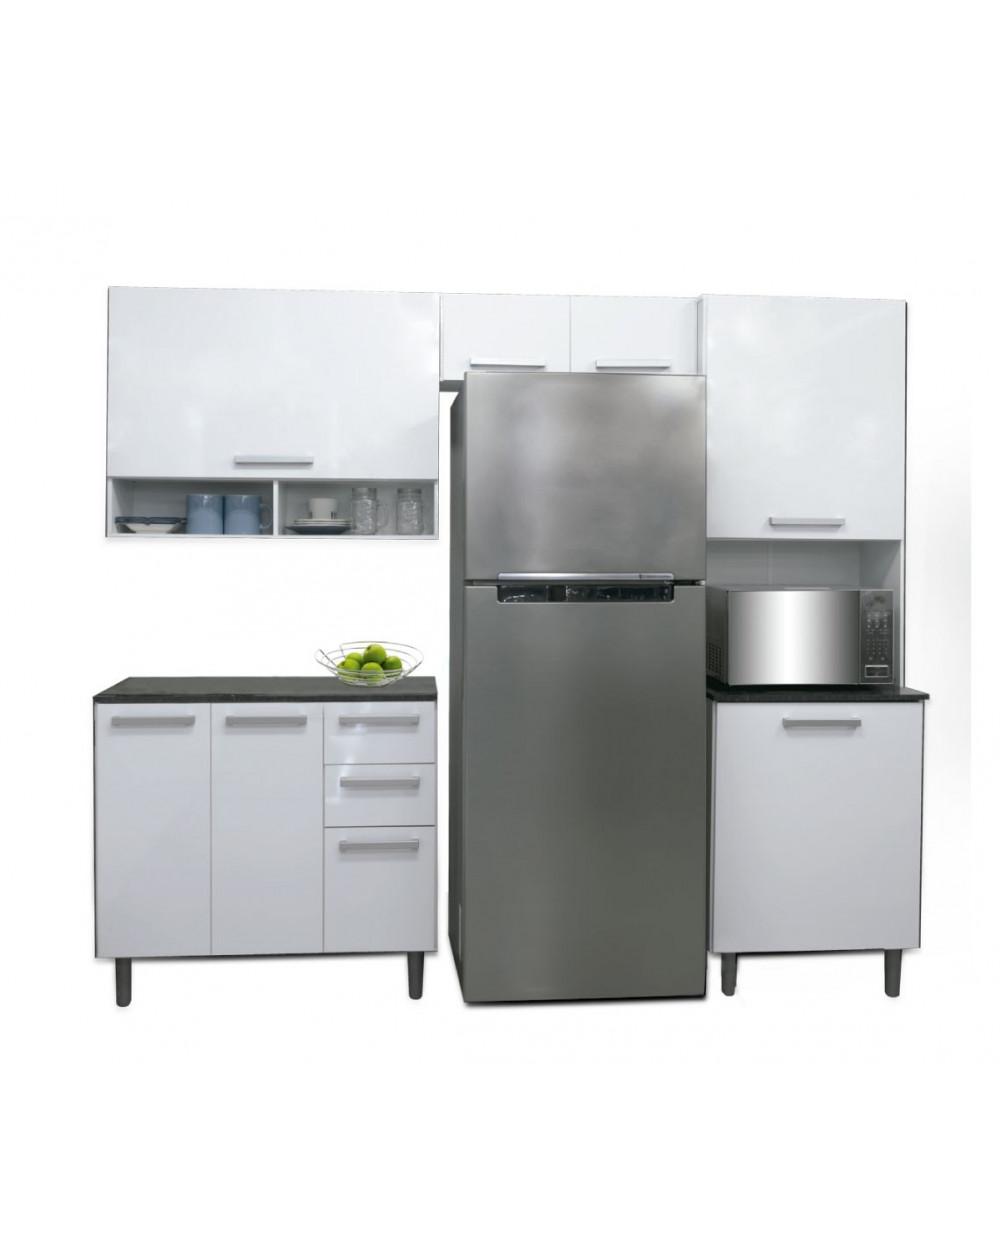 Familia mueble de cocina slim 6500500 6510302 for Canal cocina cocina de familia